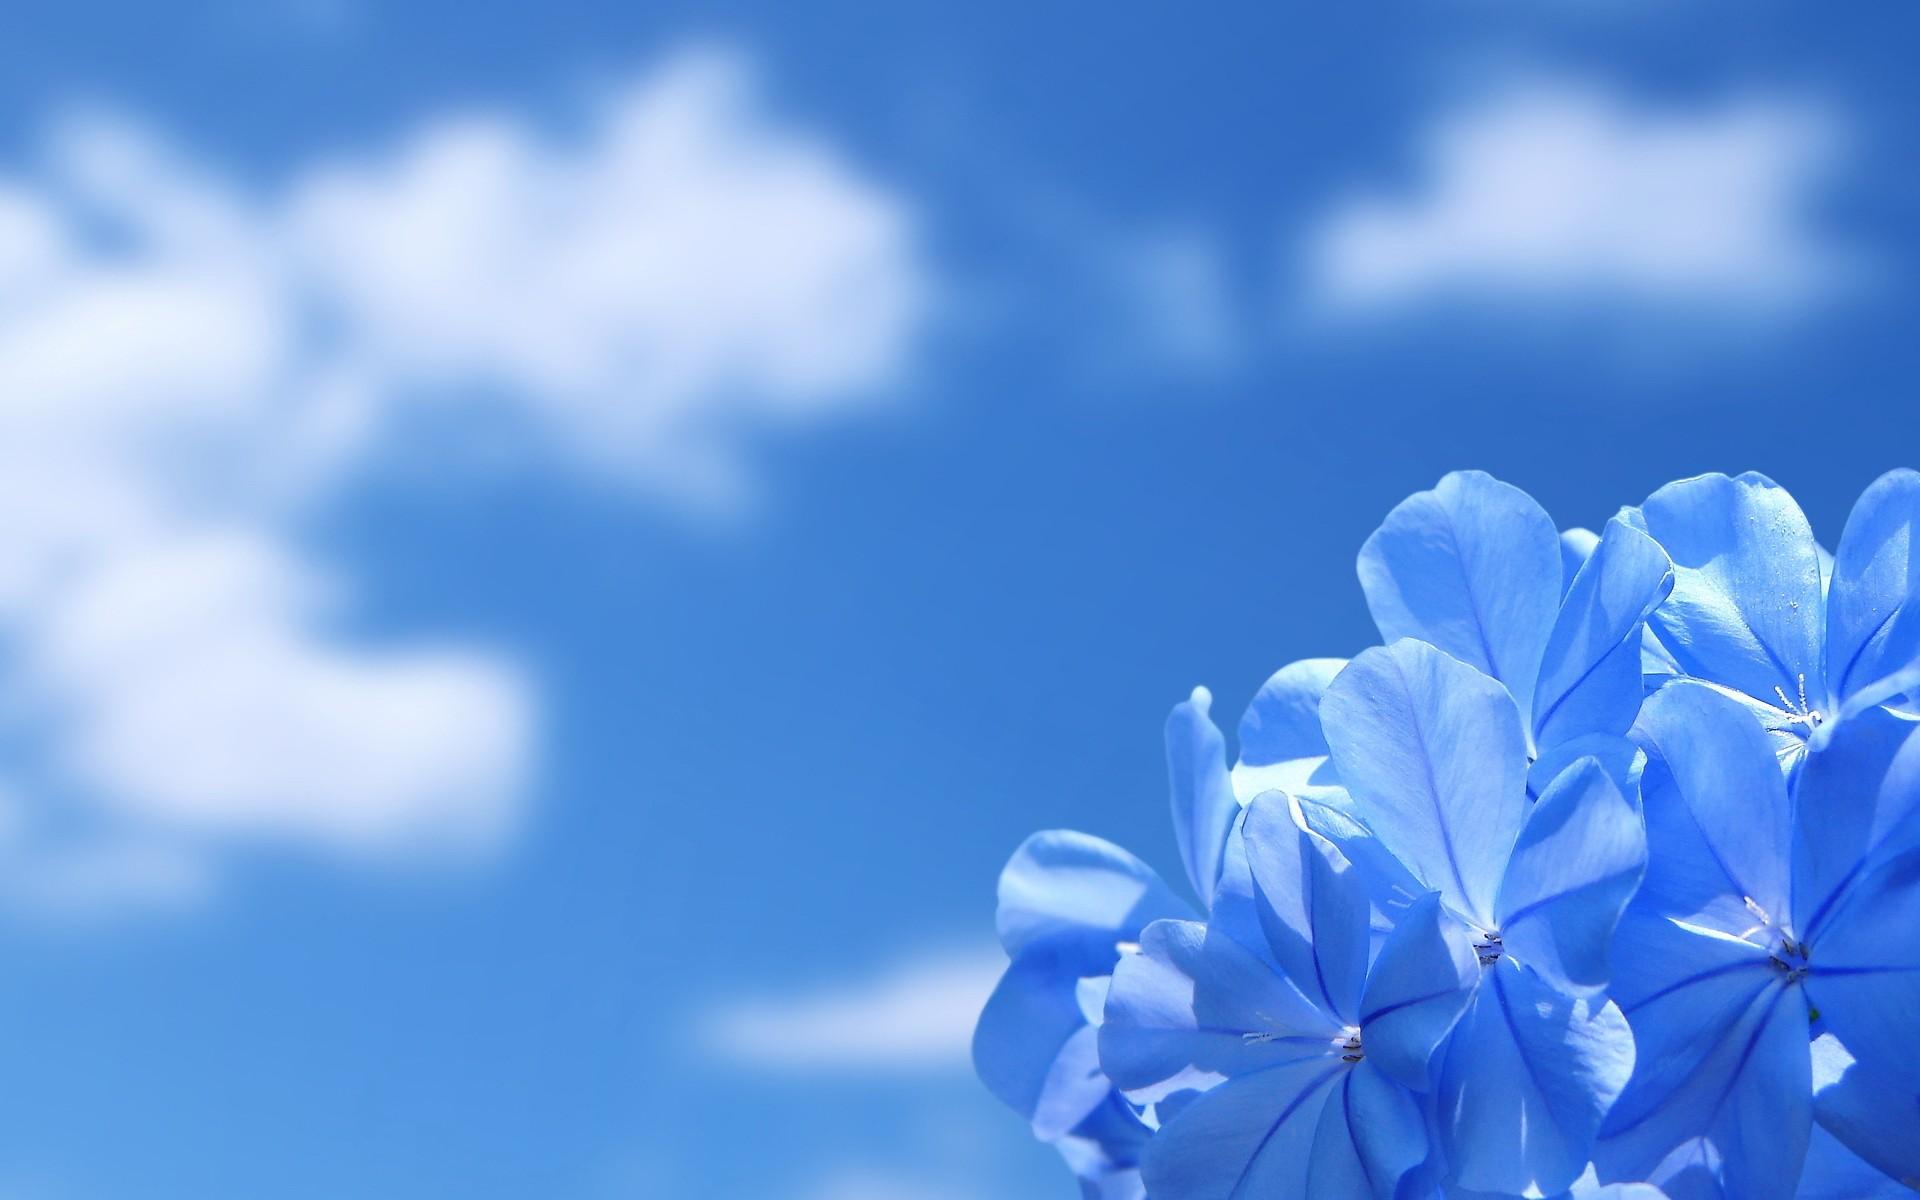 Desktop blue wallpapers HD Wallpaper 1920x1200